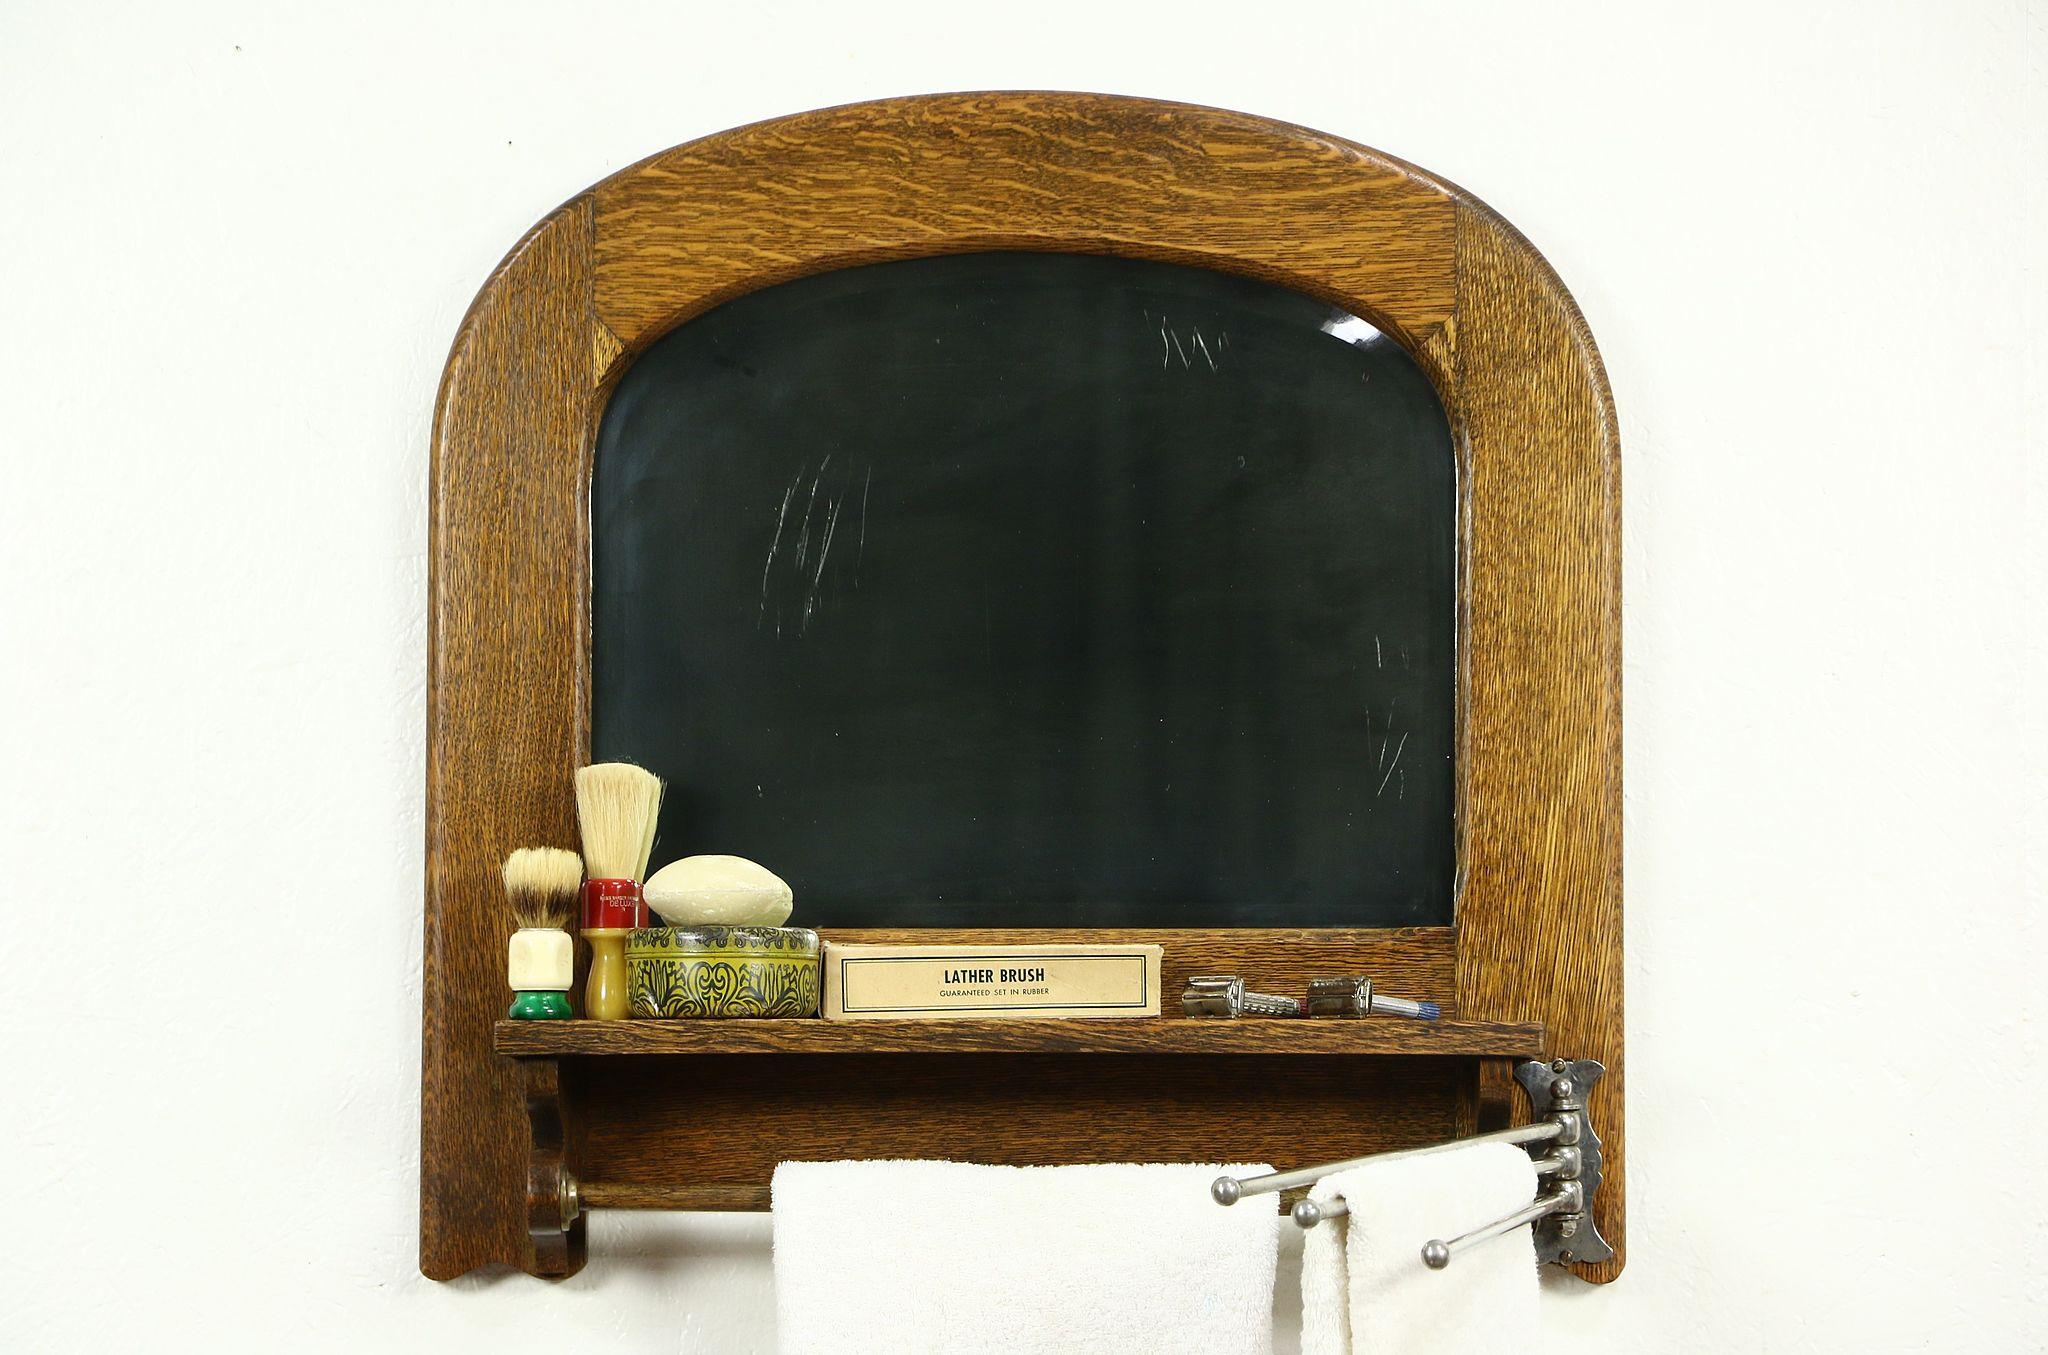 Oak bar mirrors with shelves - Oak 1900 Antique Beveled Barber Shop Or Bathroom Mirror Towel Bars